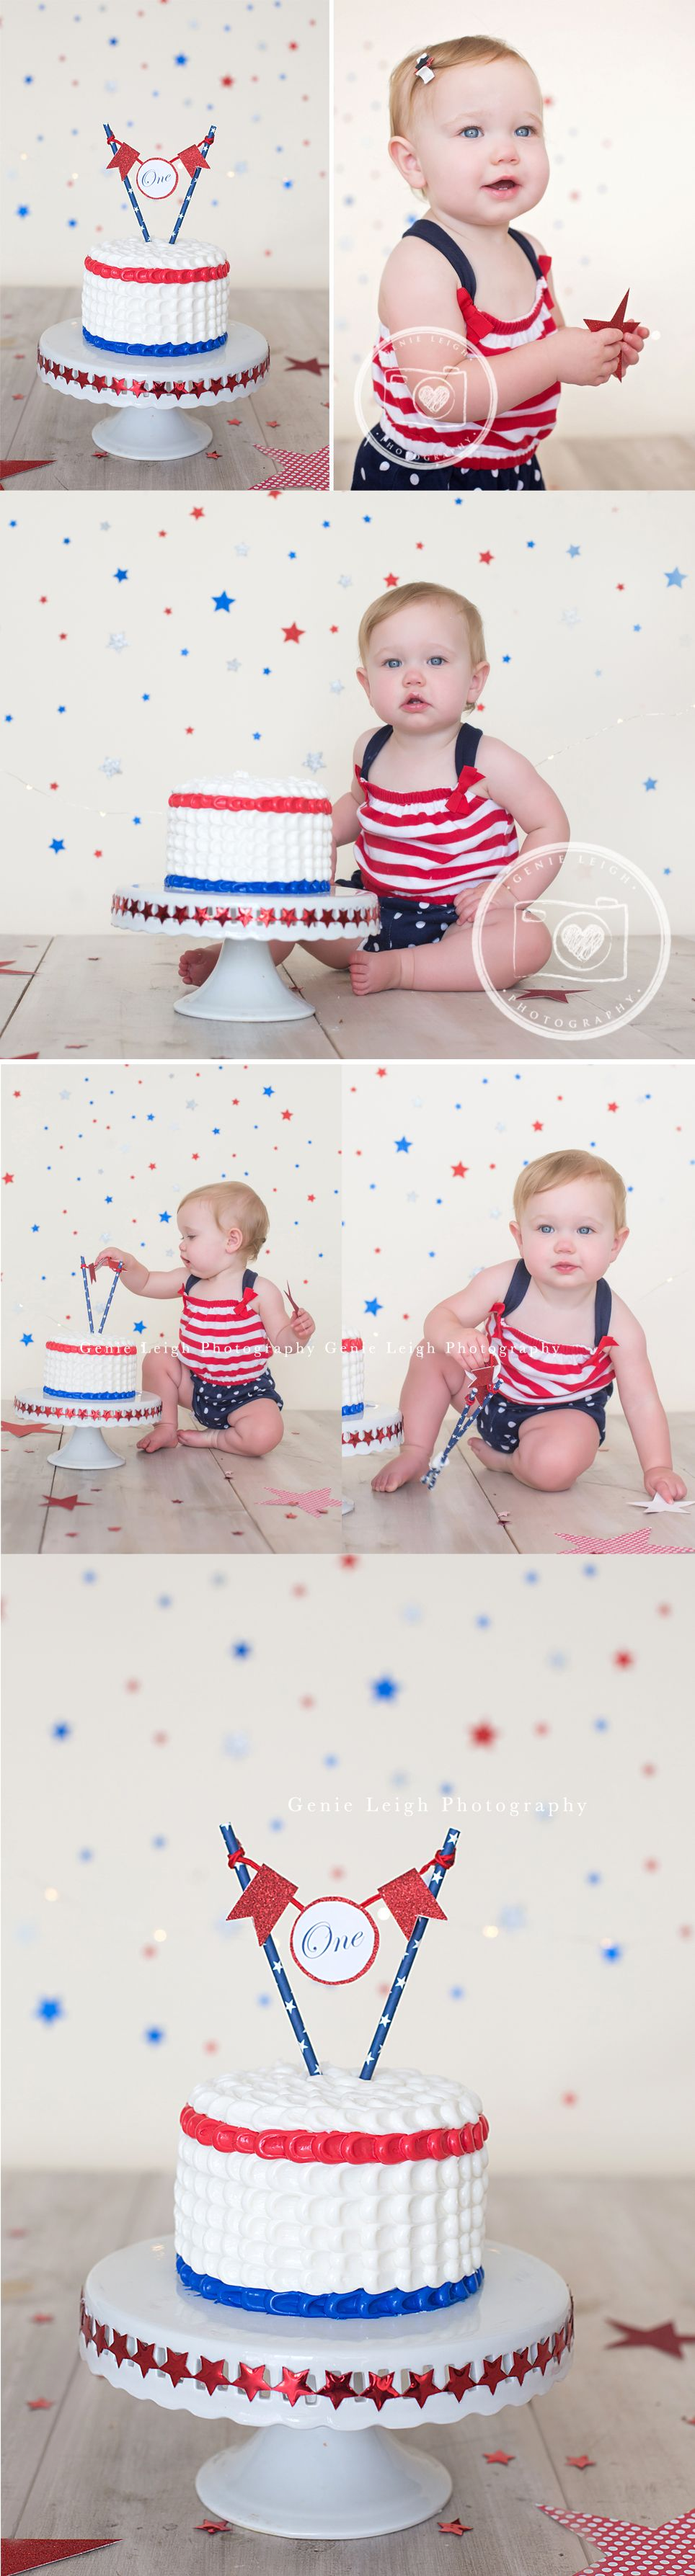 Incredible 4Th Of July Birthday Cake Smash With Images Birthday Cake Funny Birthday Cards Online Inifofree Goldxyz